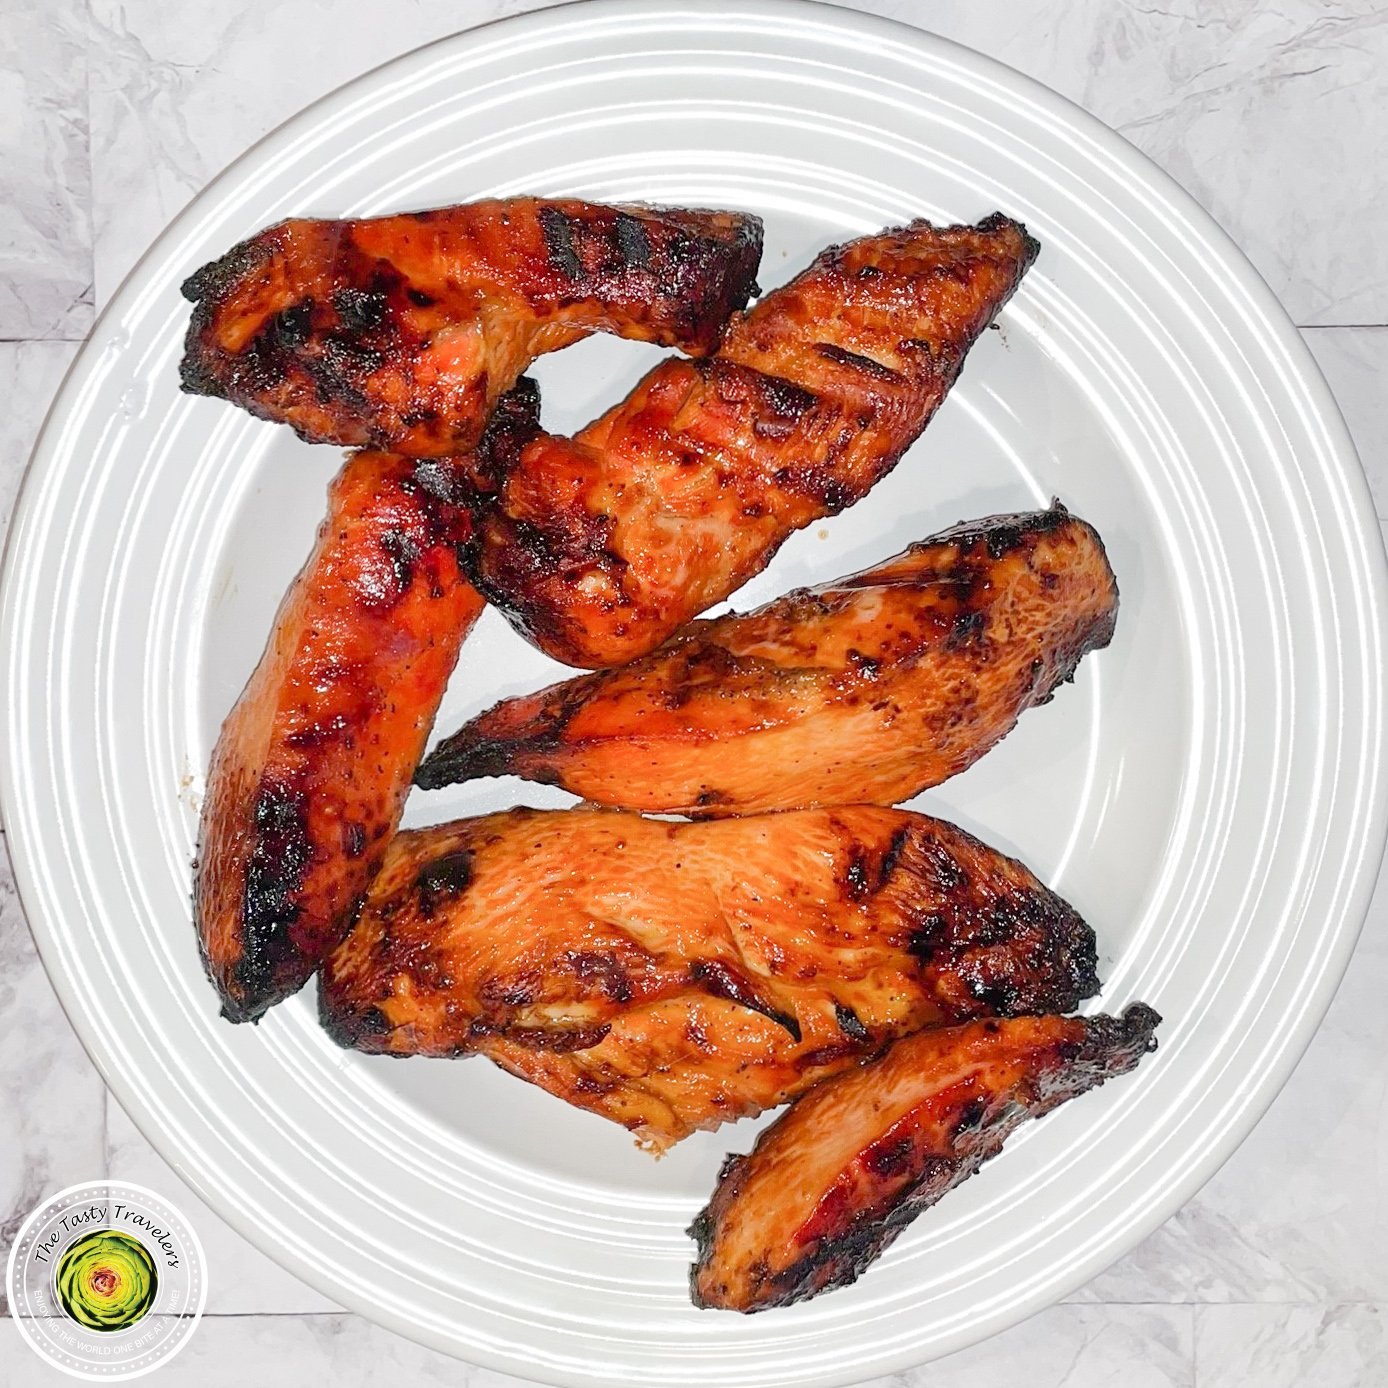 Ninja Foodi Grill Spicy Honey Garlic Chicken